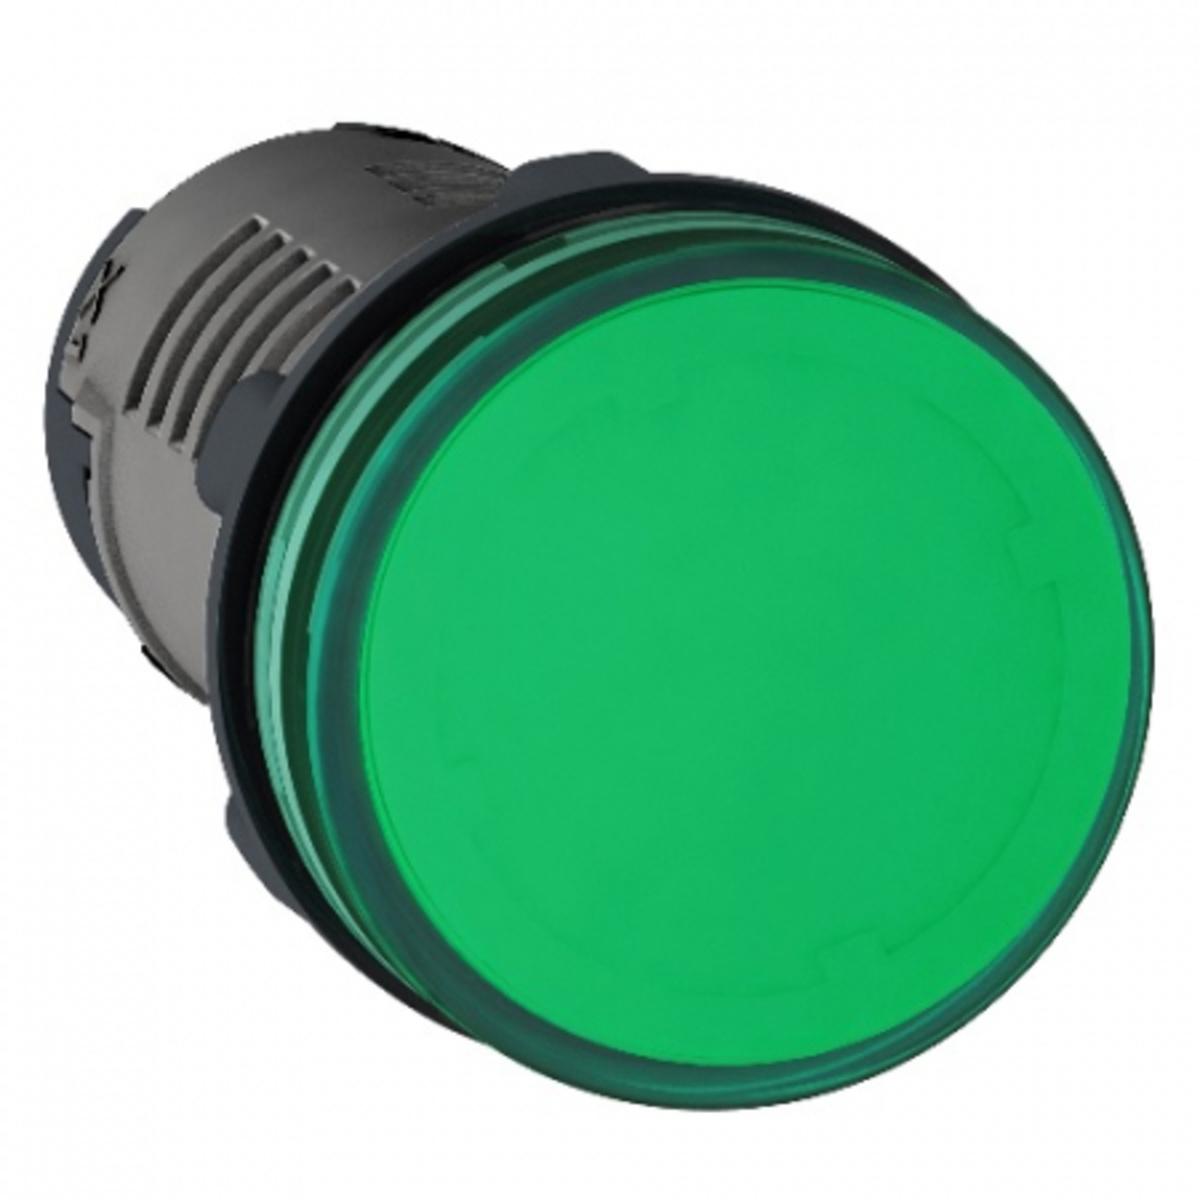 SINALIZADOR LED 22MM VD 24V XA2EVB3LC SCHNEIDER